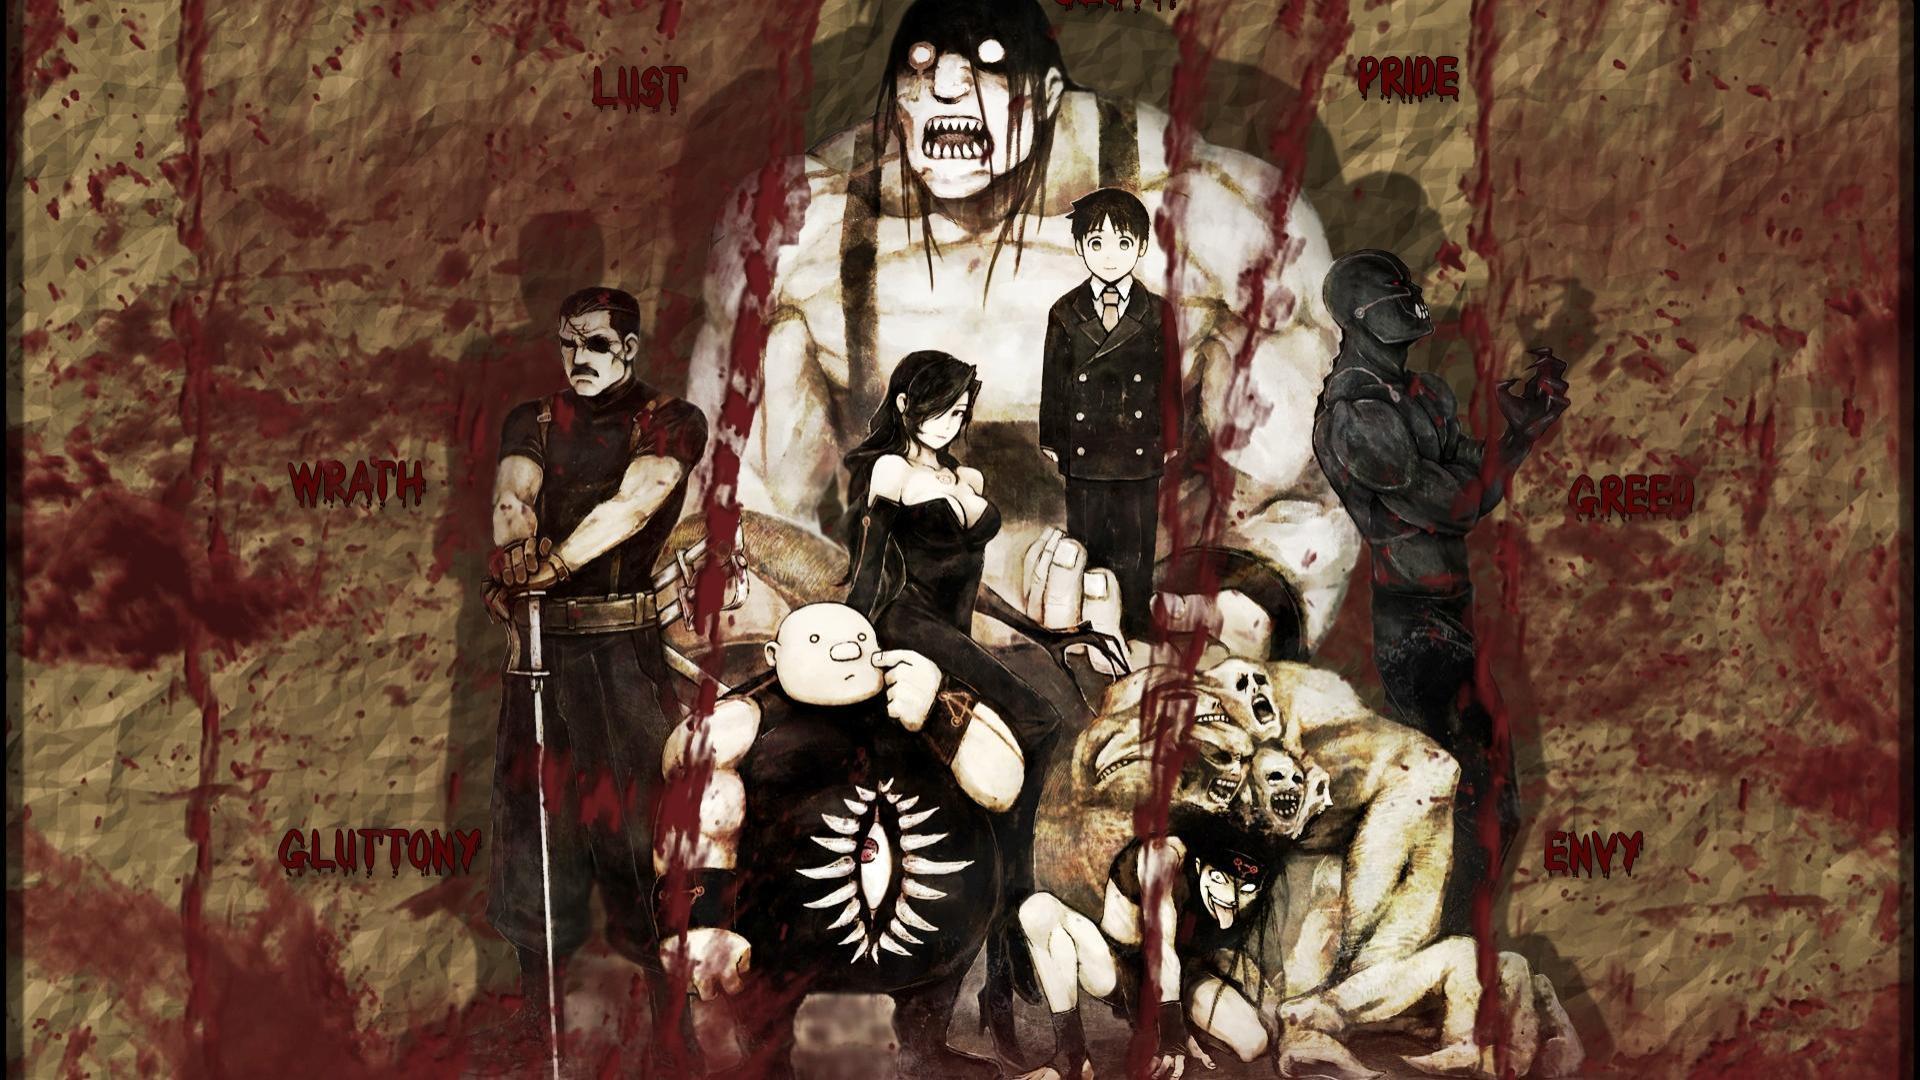 Fullmetal Alchemist Seven Deadly Sins Lust FMA Gluttony